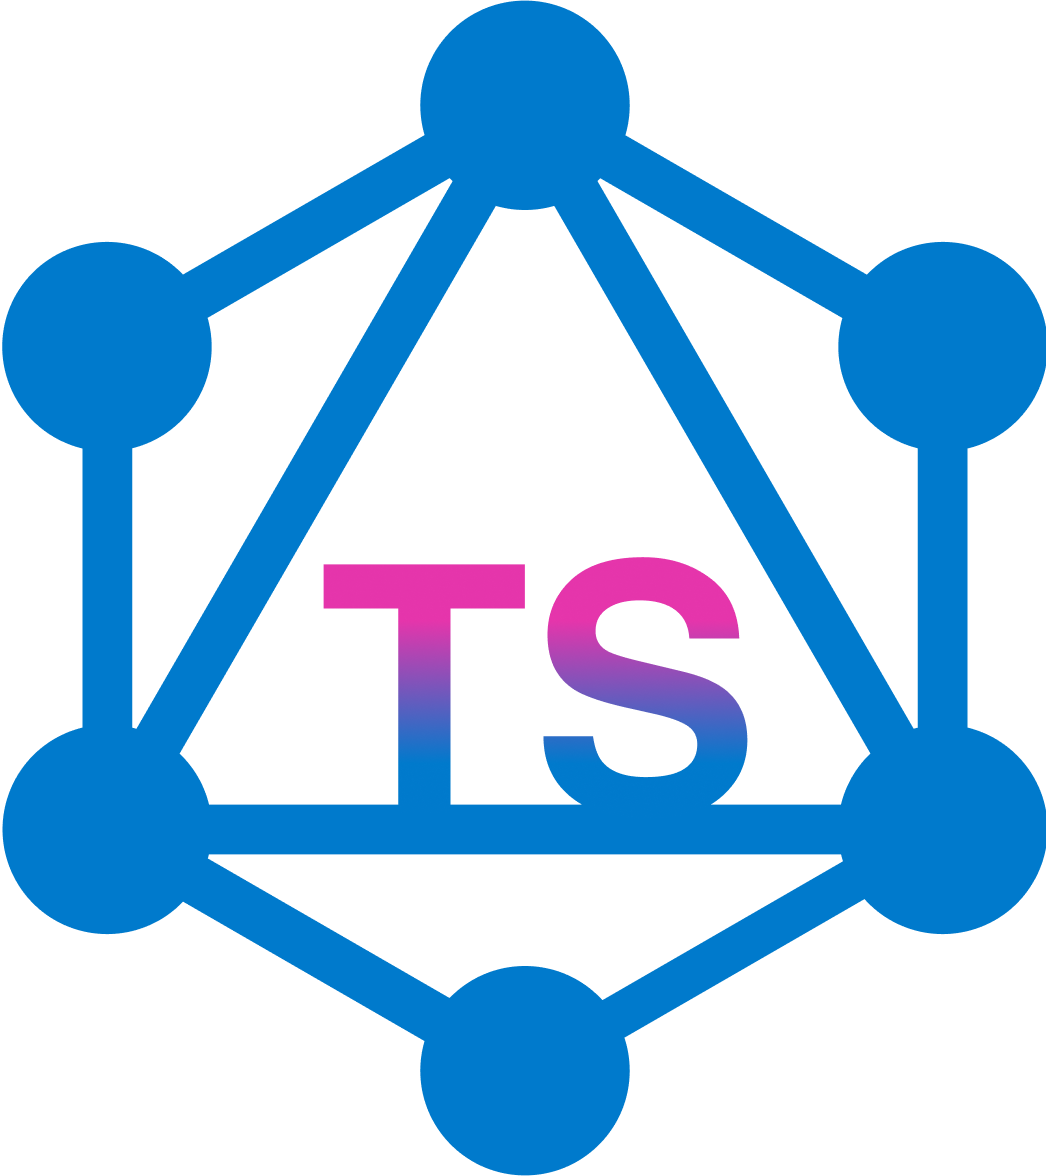 sgts logo